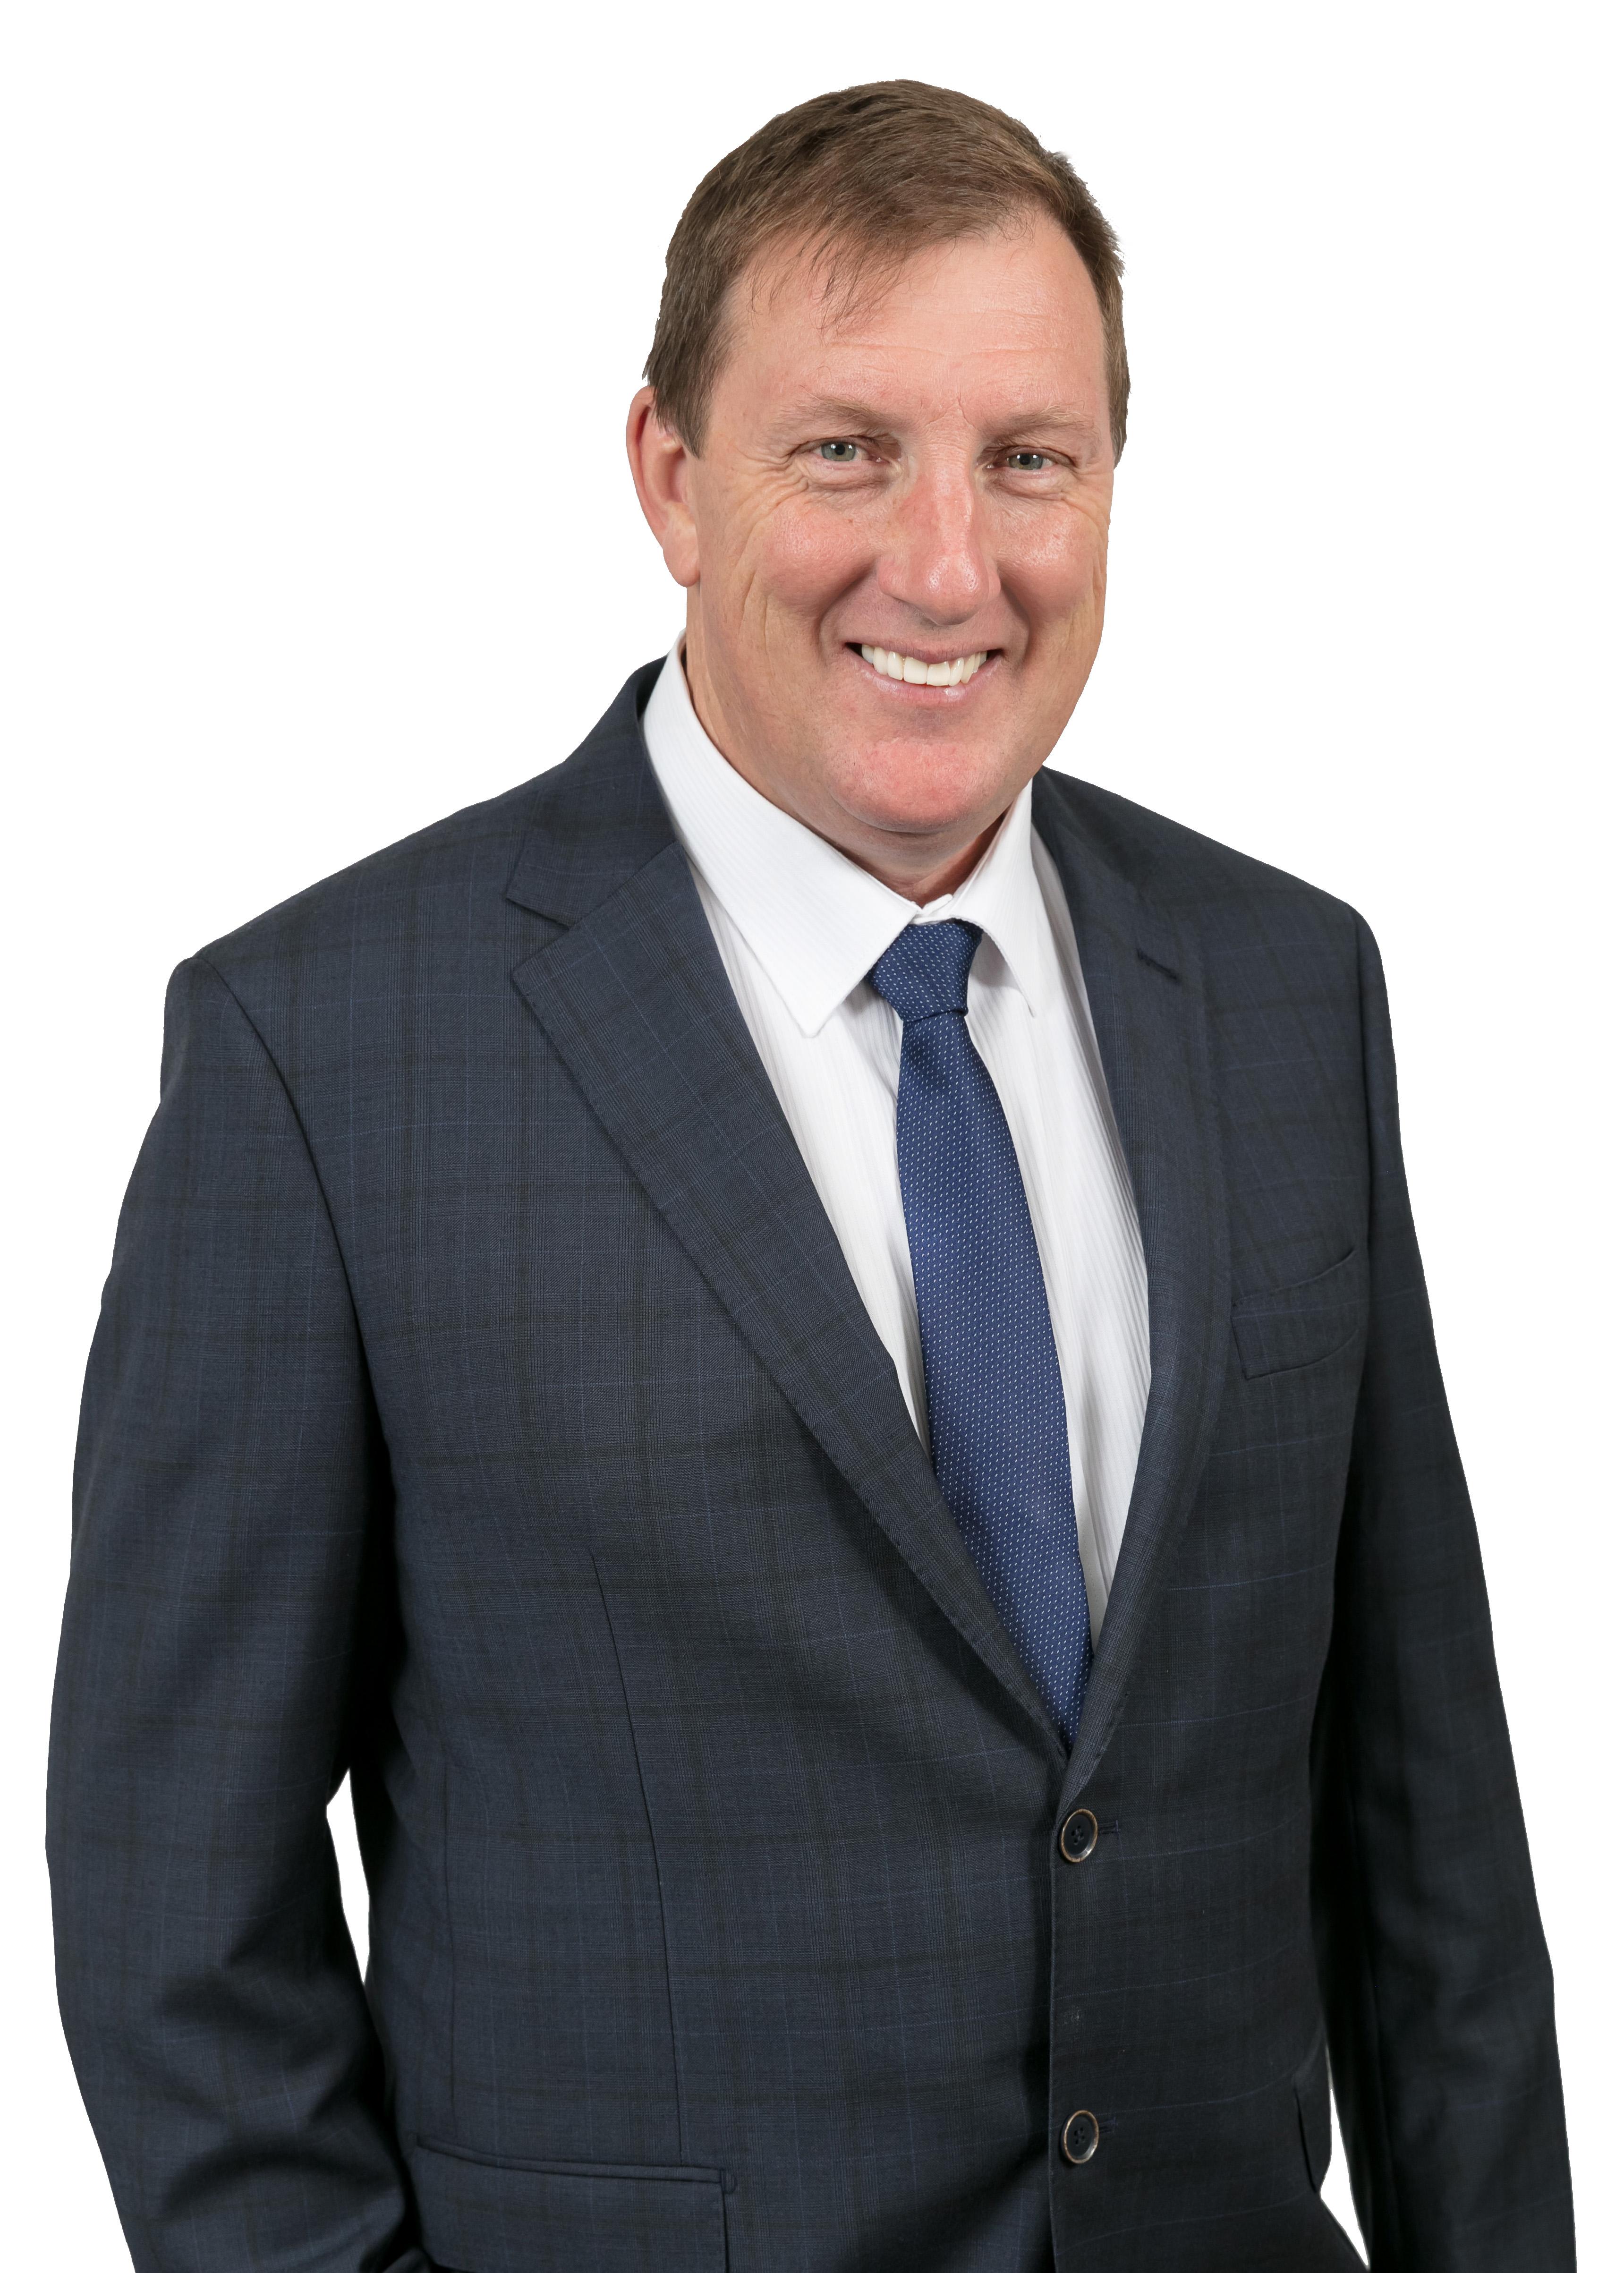 Byron Sedgwick